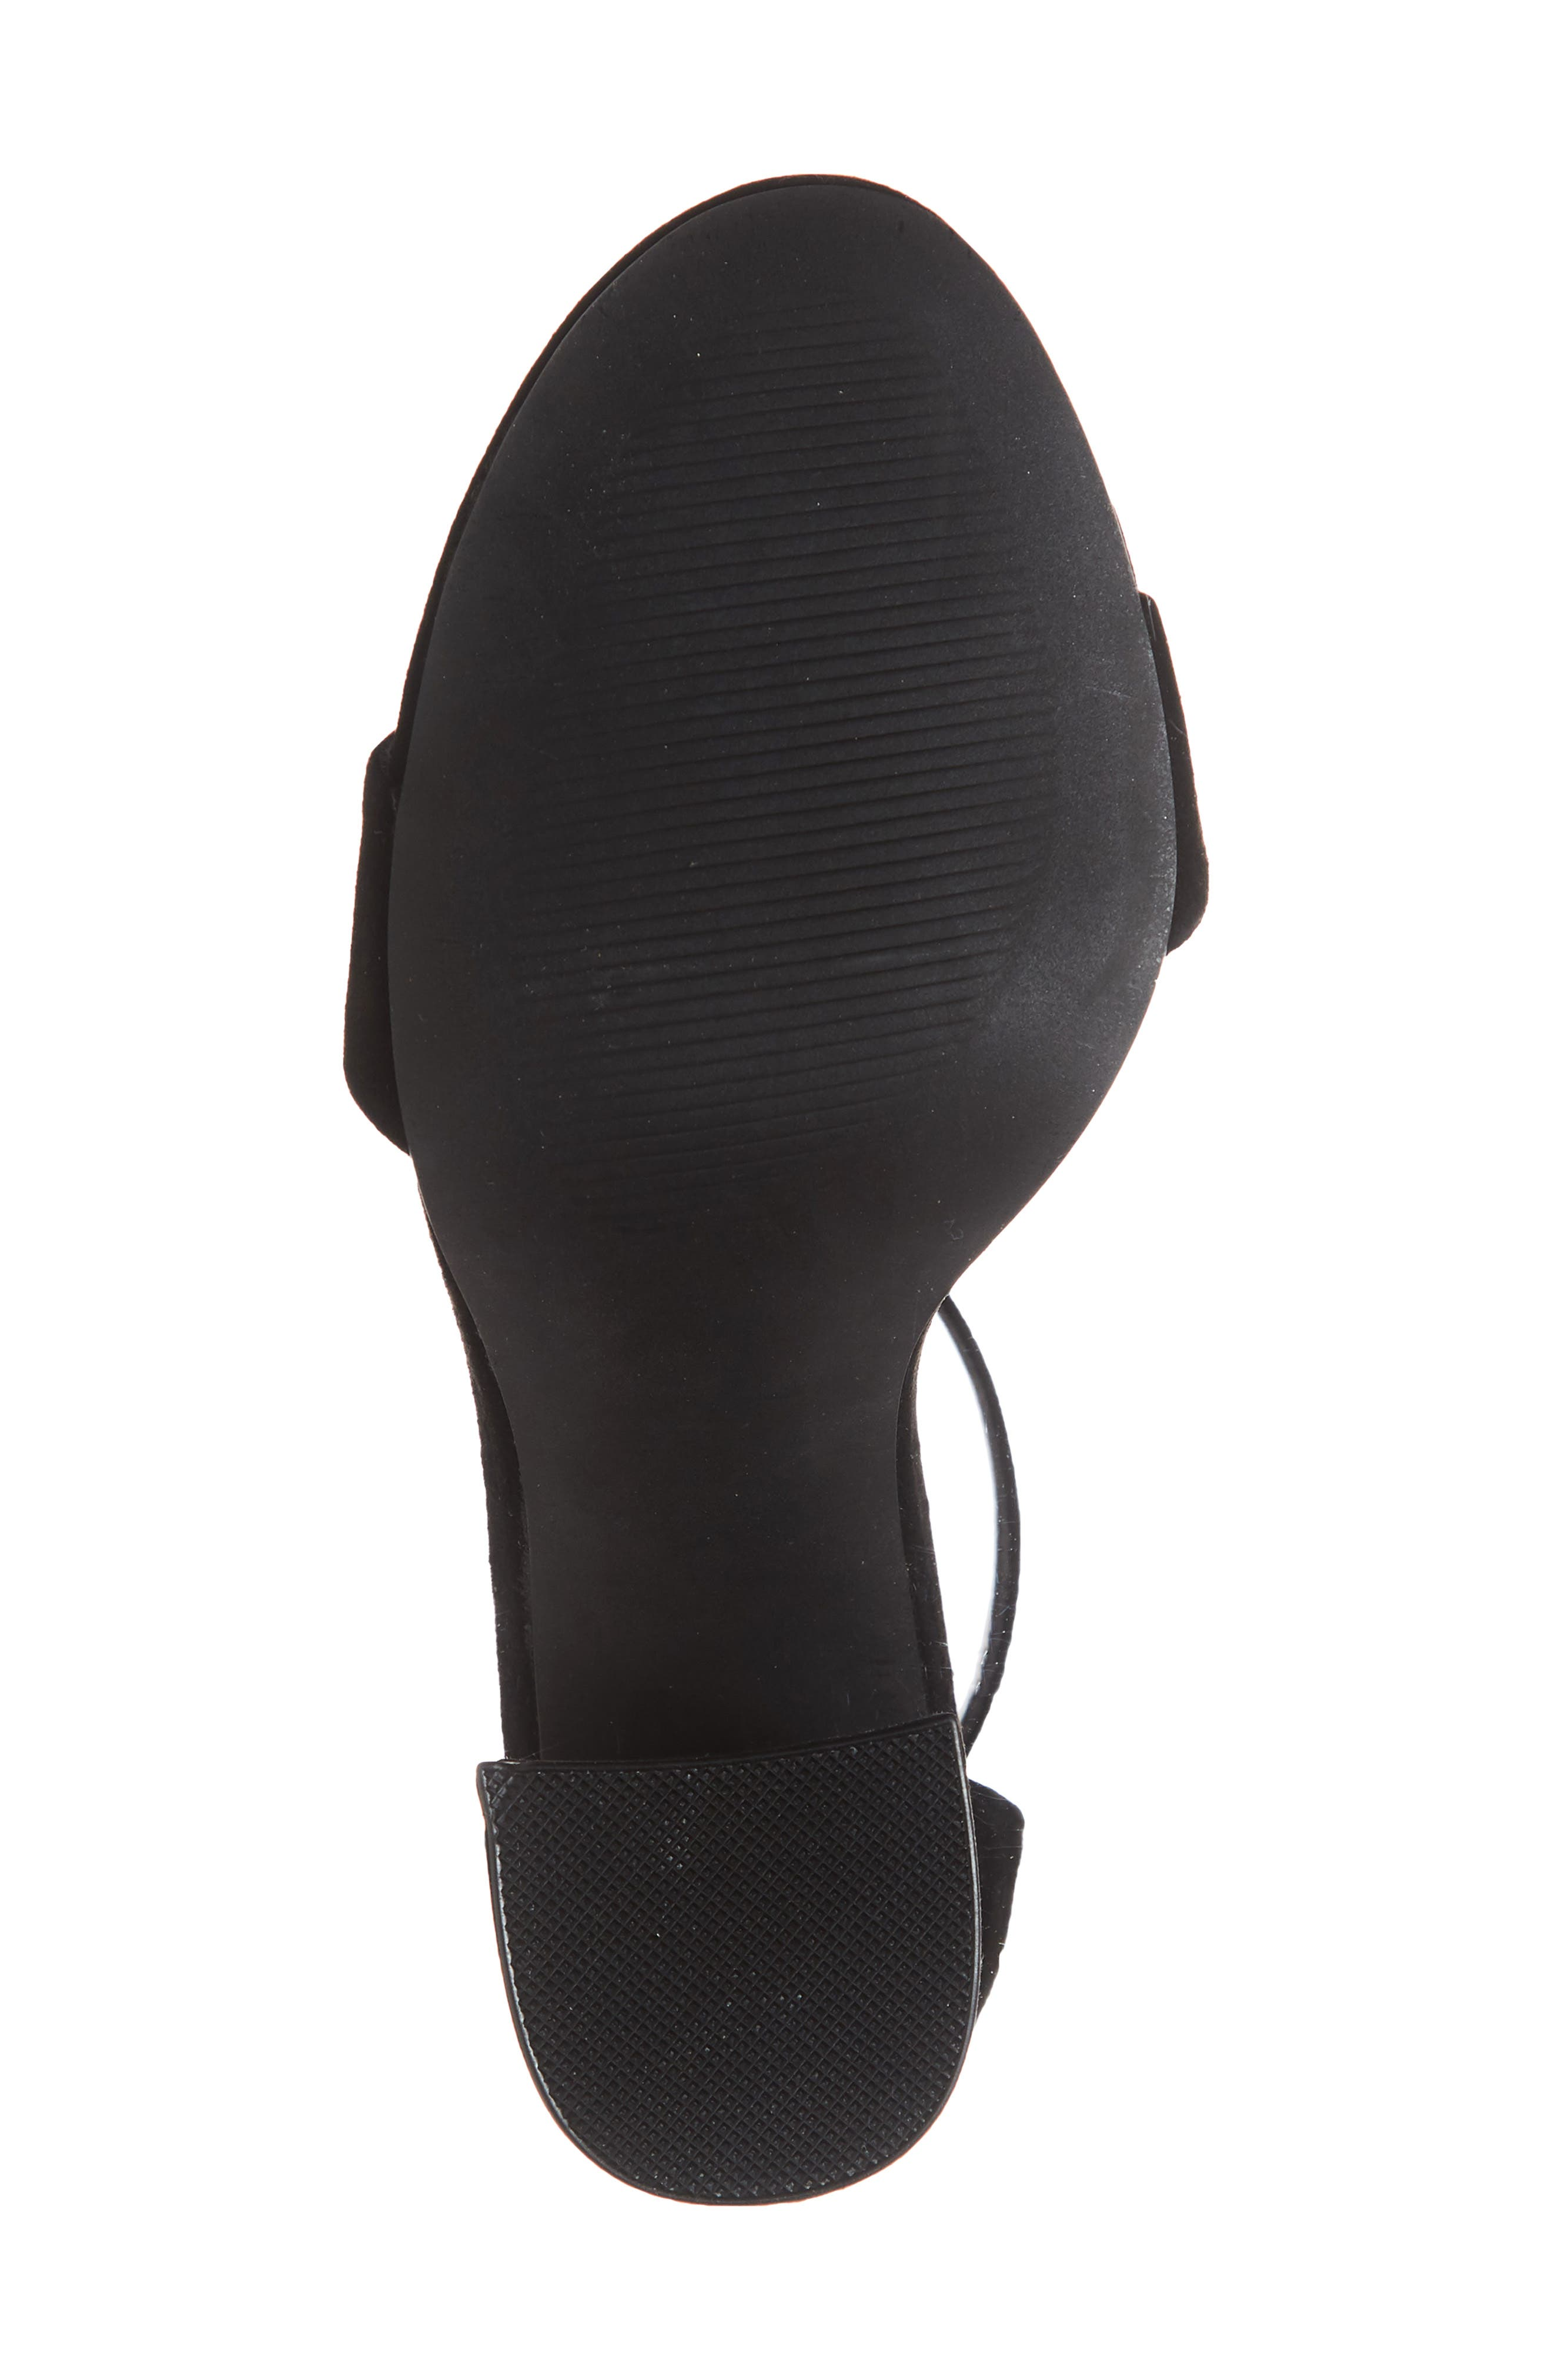 Joss Ankle Strap Sandal,                             Alternate thumbnail 6, color,                             BLACK SUEDE